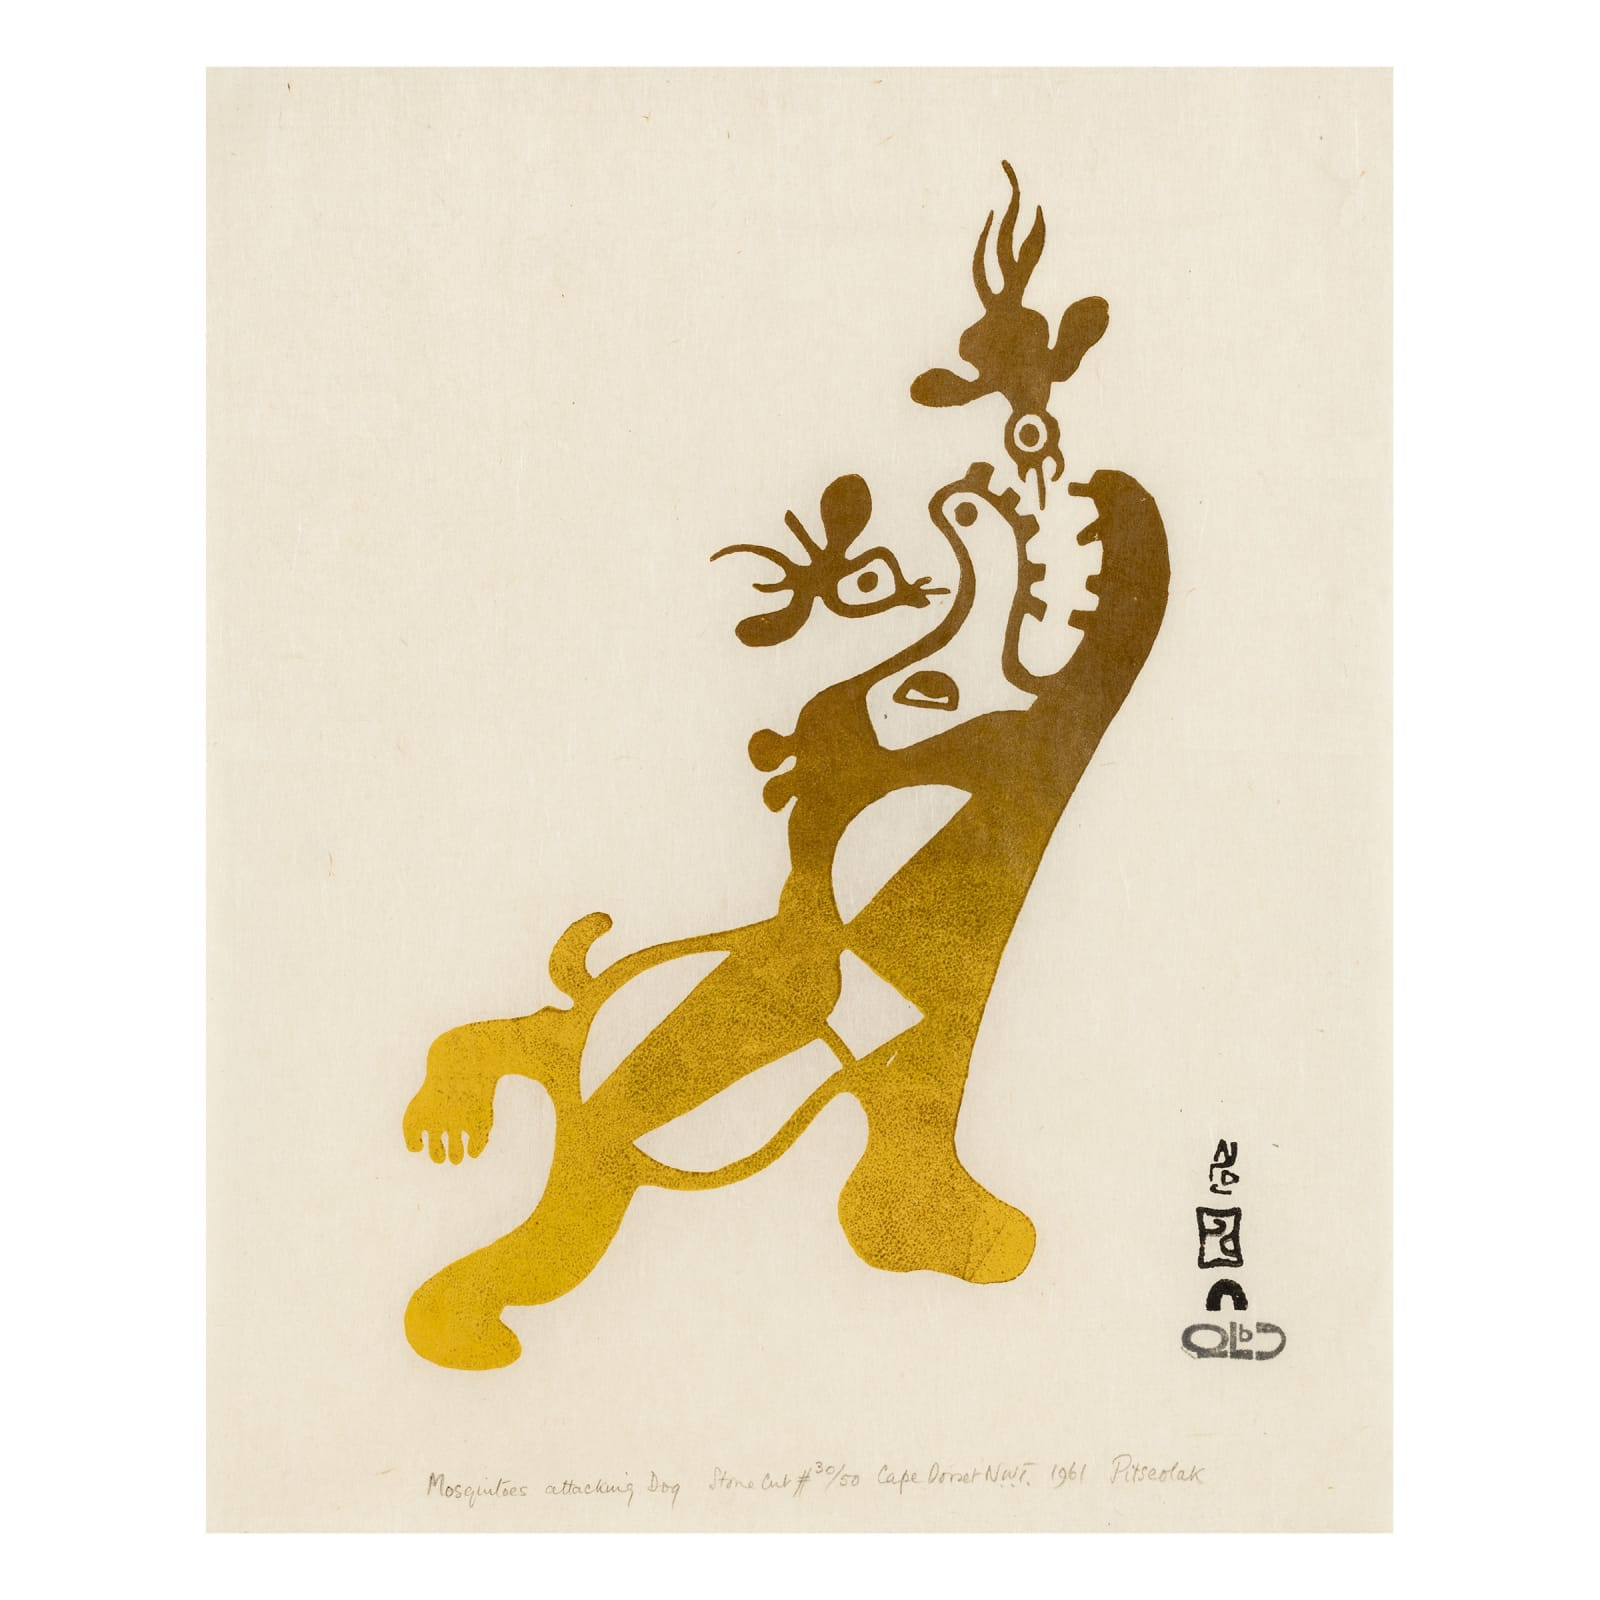 PITSEOLAK ASHOONA, O.C., R.C.A (1904-1983) KINNGAIT (CAPE DORSET) Mosquitos Attacking Dog, 1961 REALIZED: $1,800